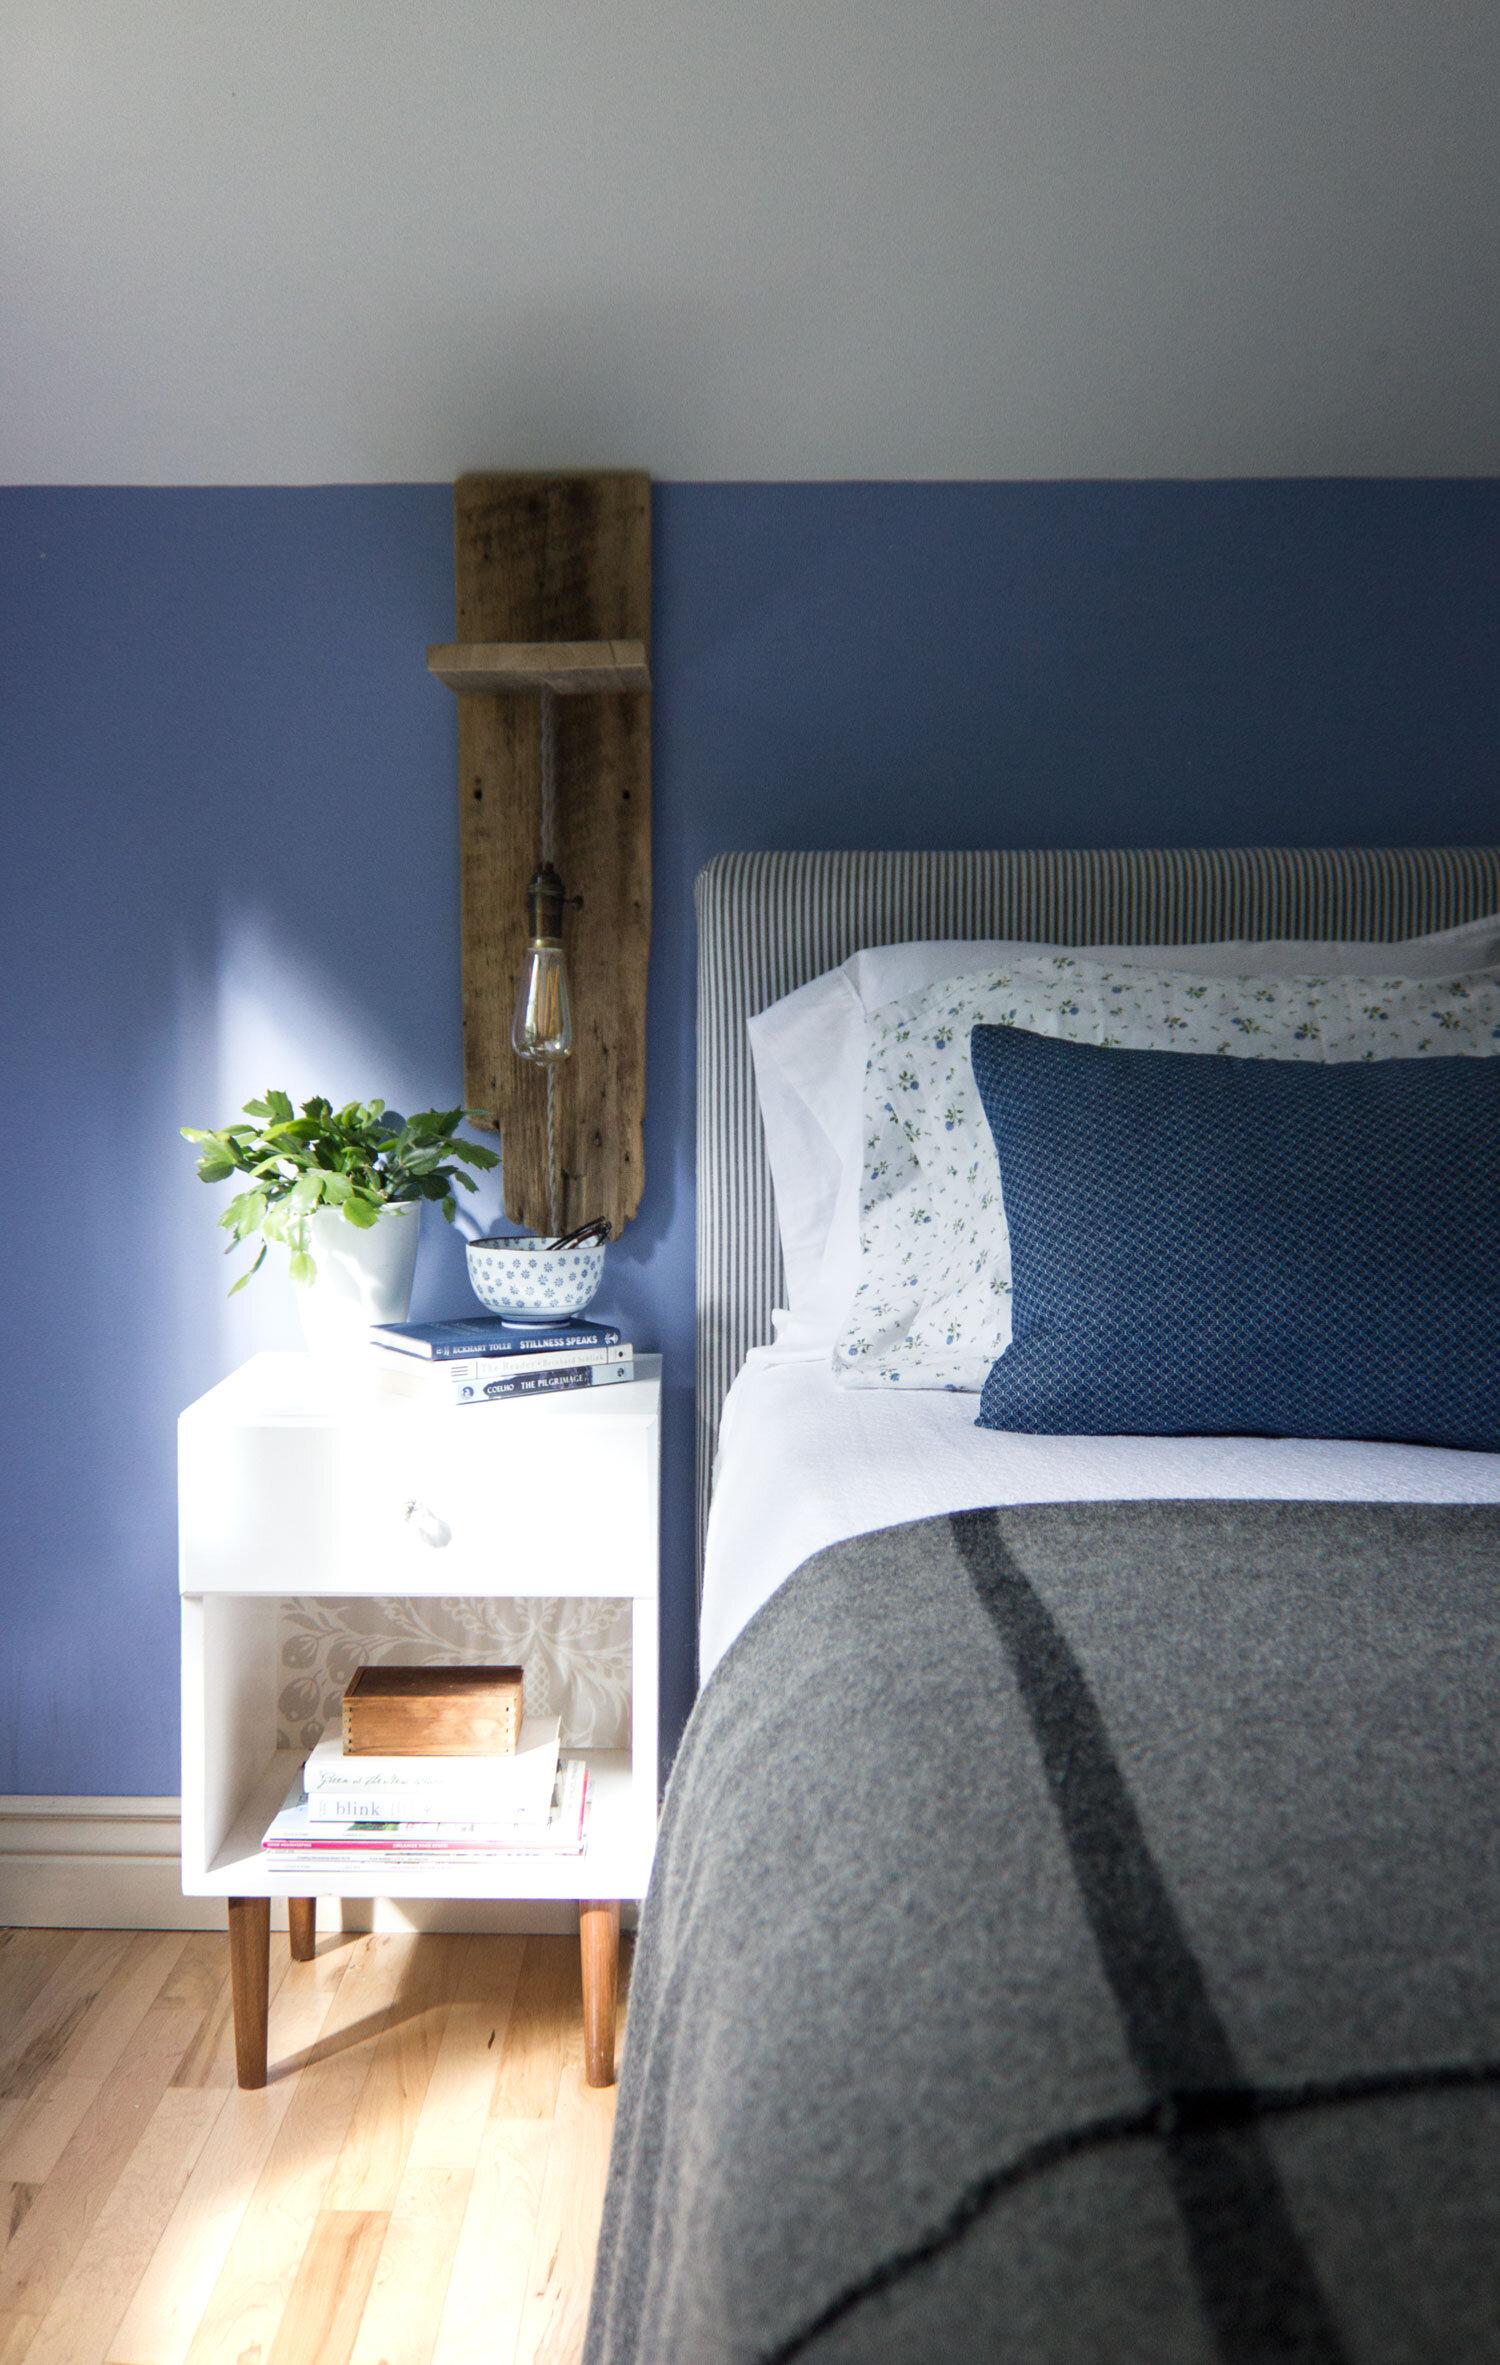 DIY谷仓板卧室灯烛台